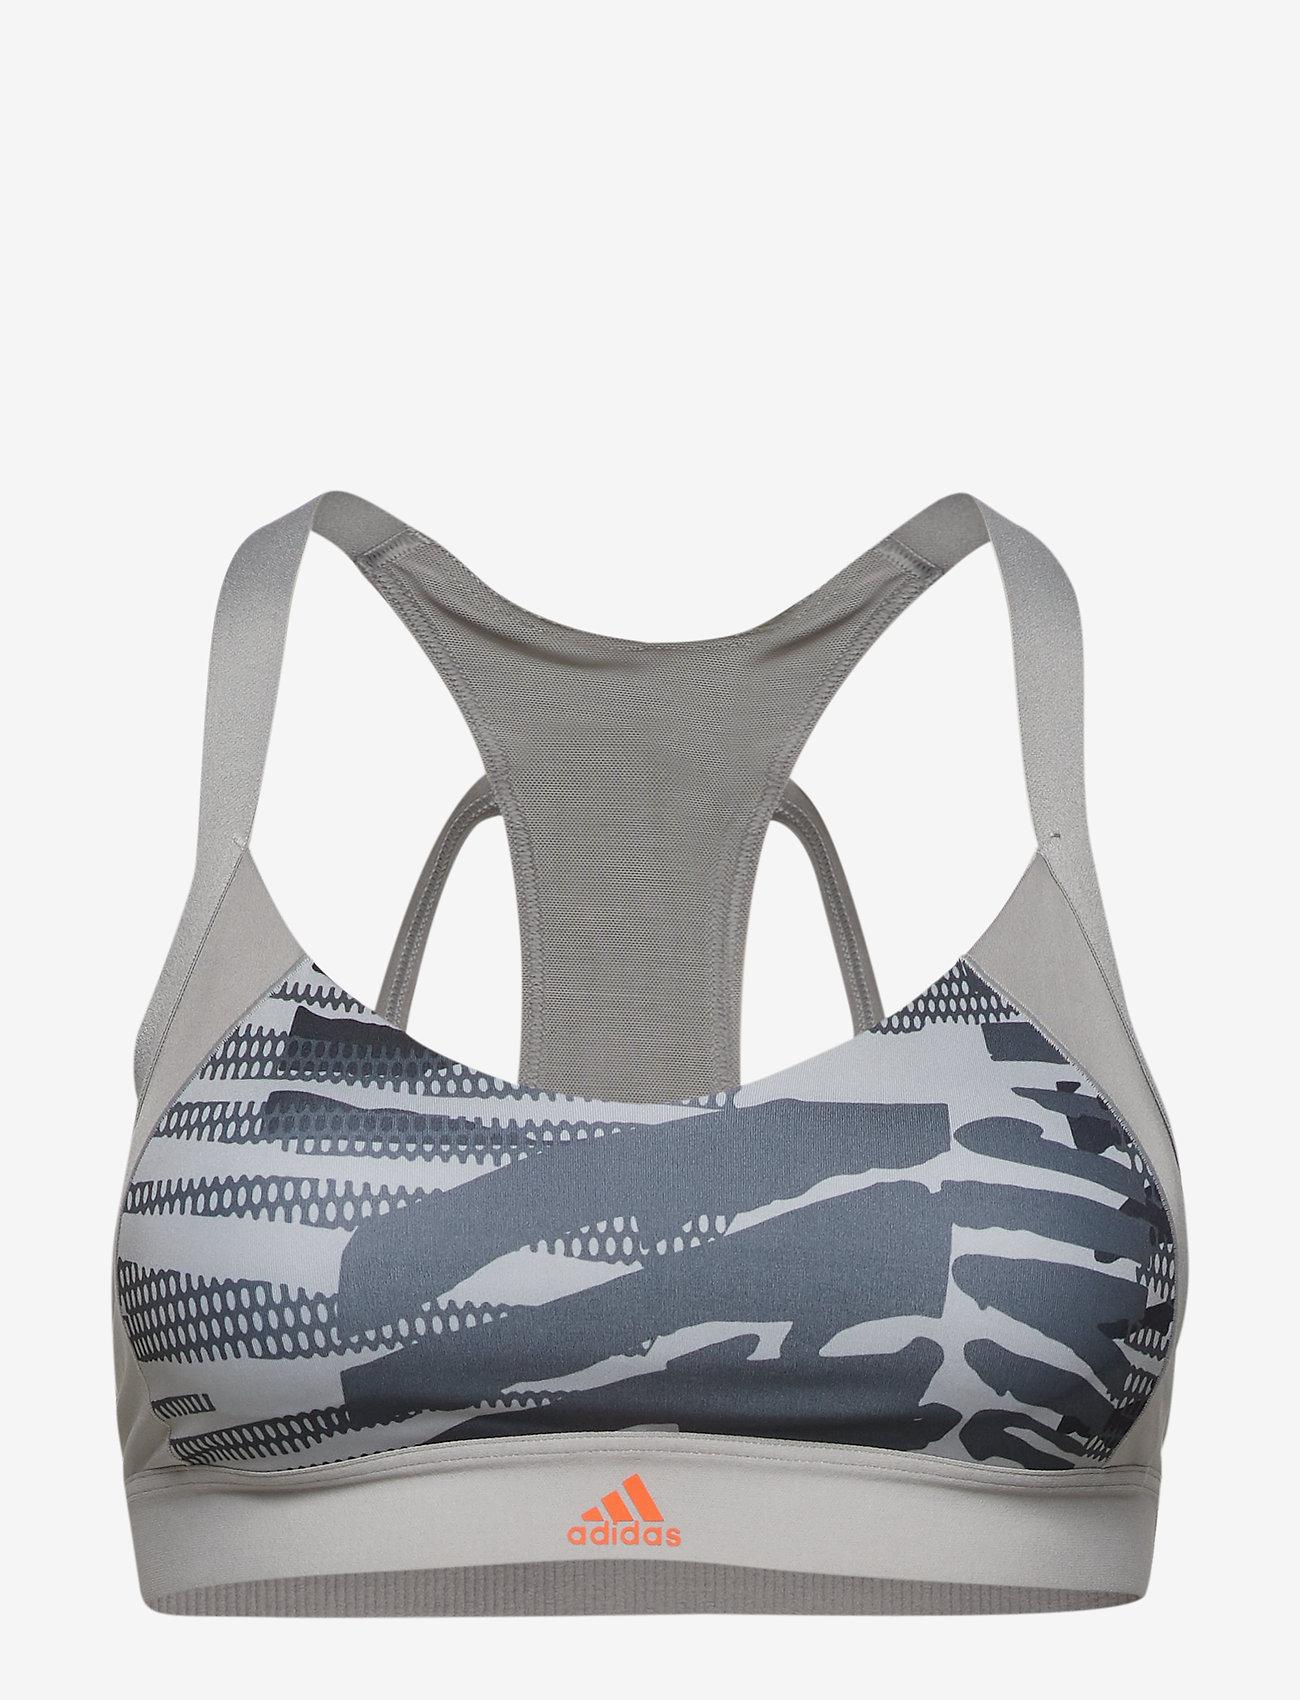 adidas Performance - AM AI Q3 BRA - sport bras: low - mgsogr/print - 1